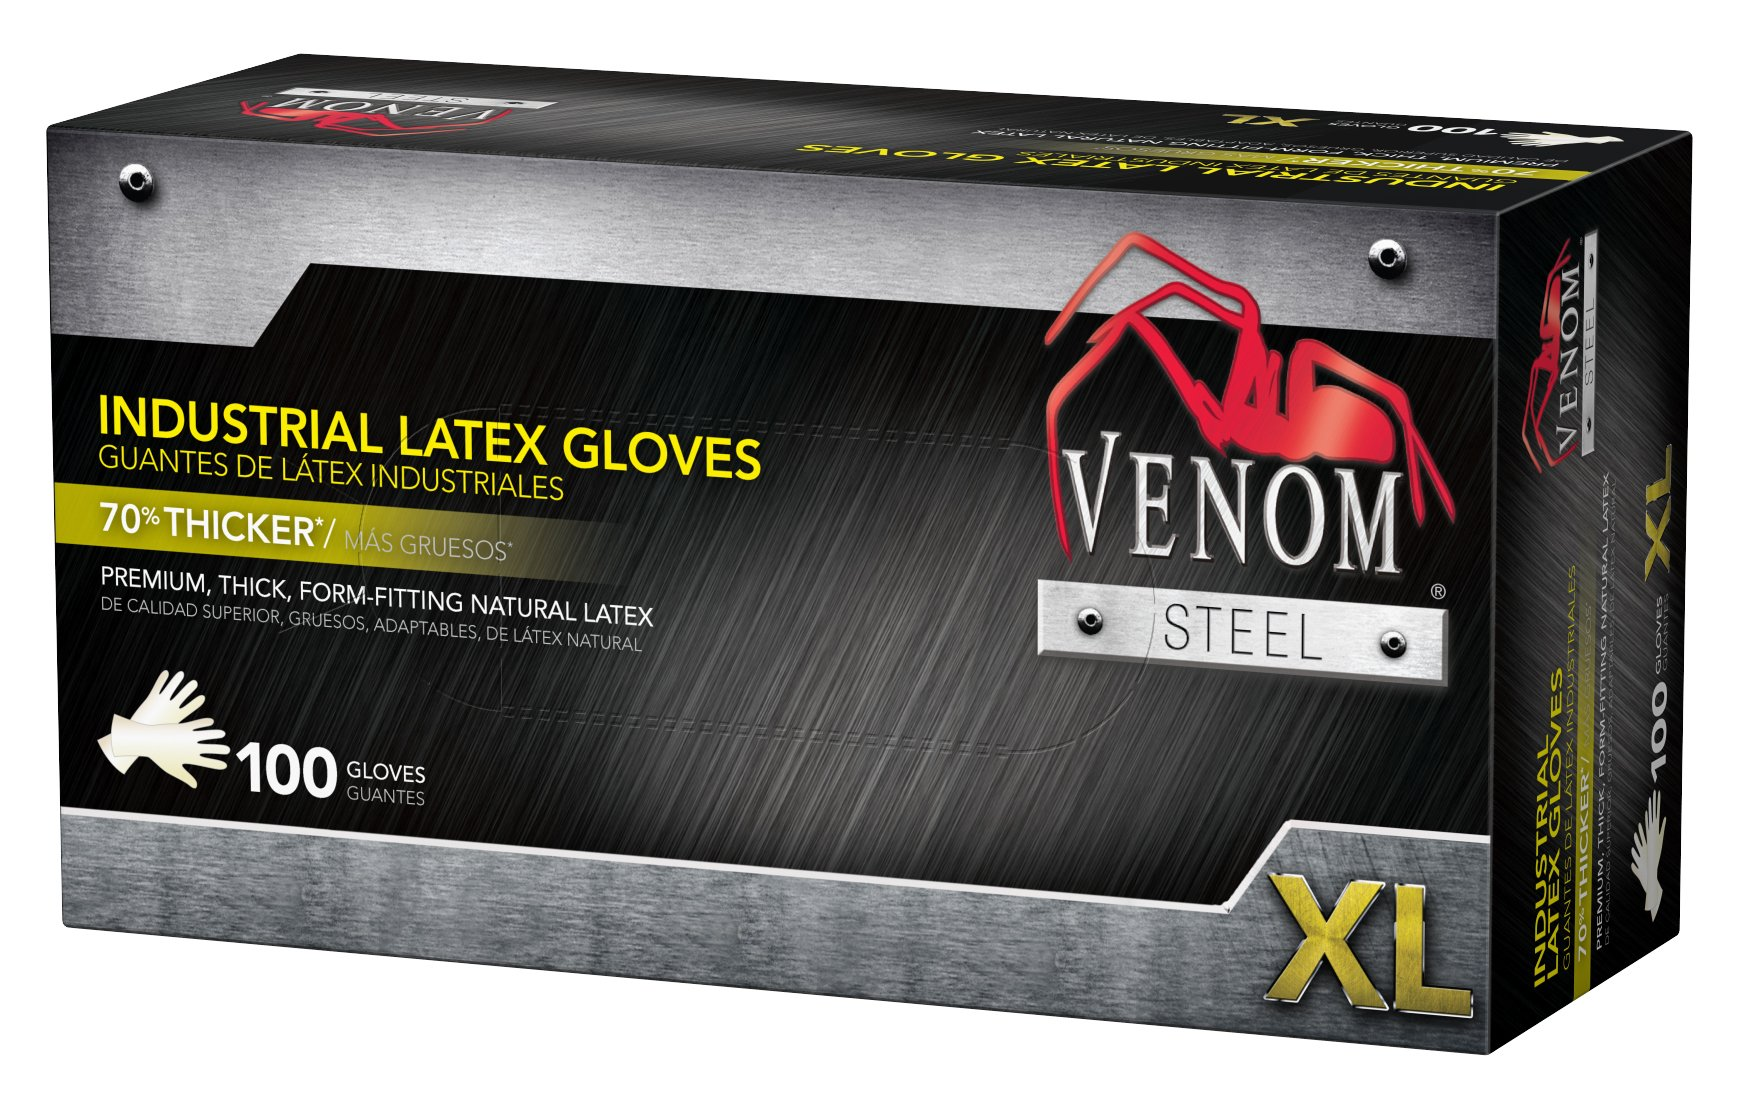 Venom VEN8124 Steel Industrial Latex Gloves, 8 mil, X-Large (Pack of 100)